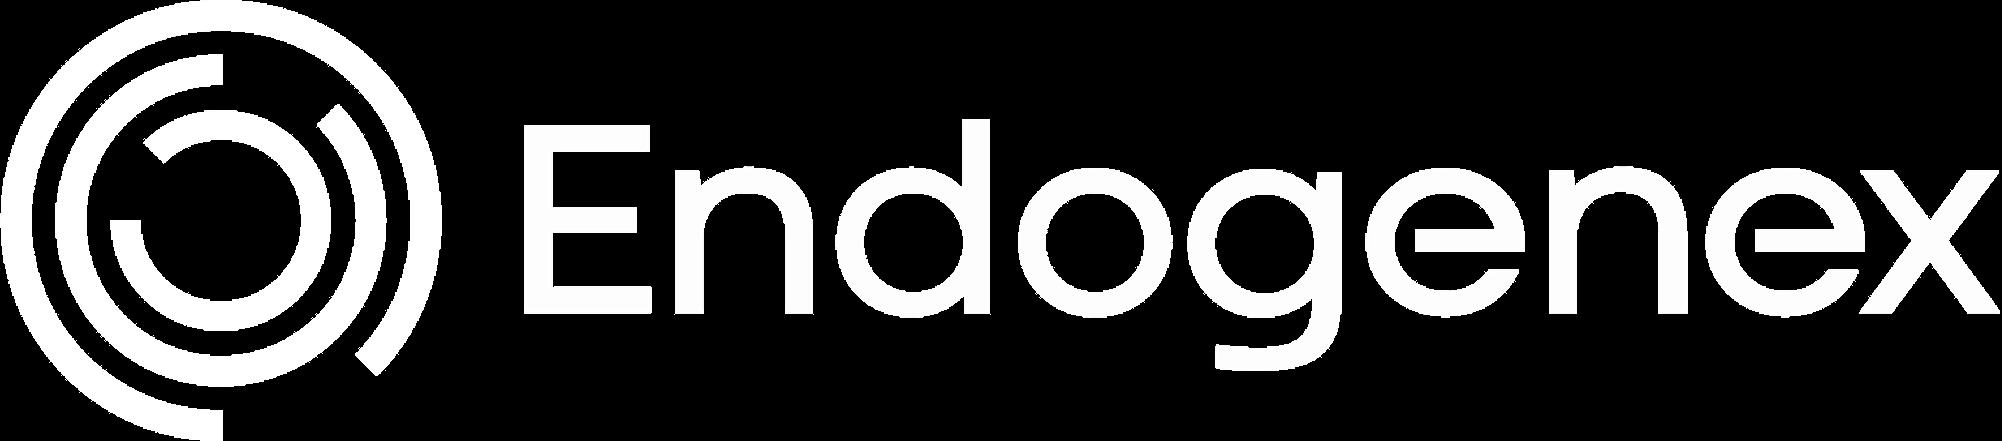 Endogenex